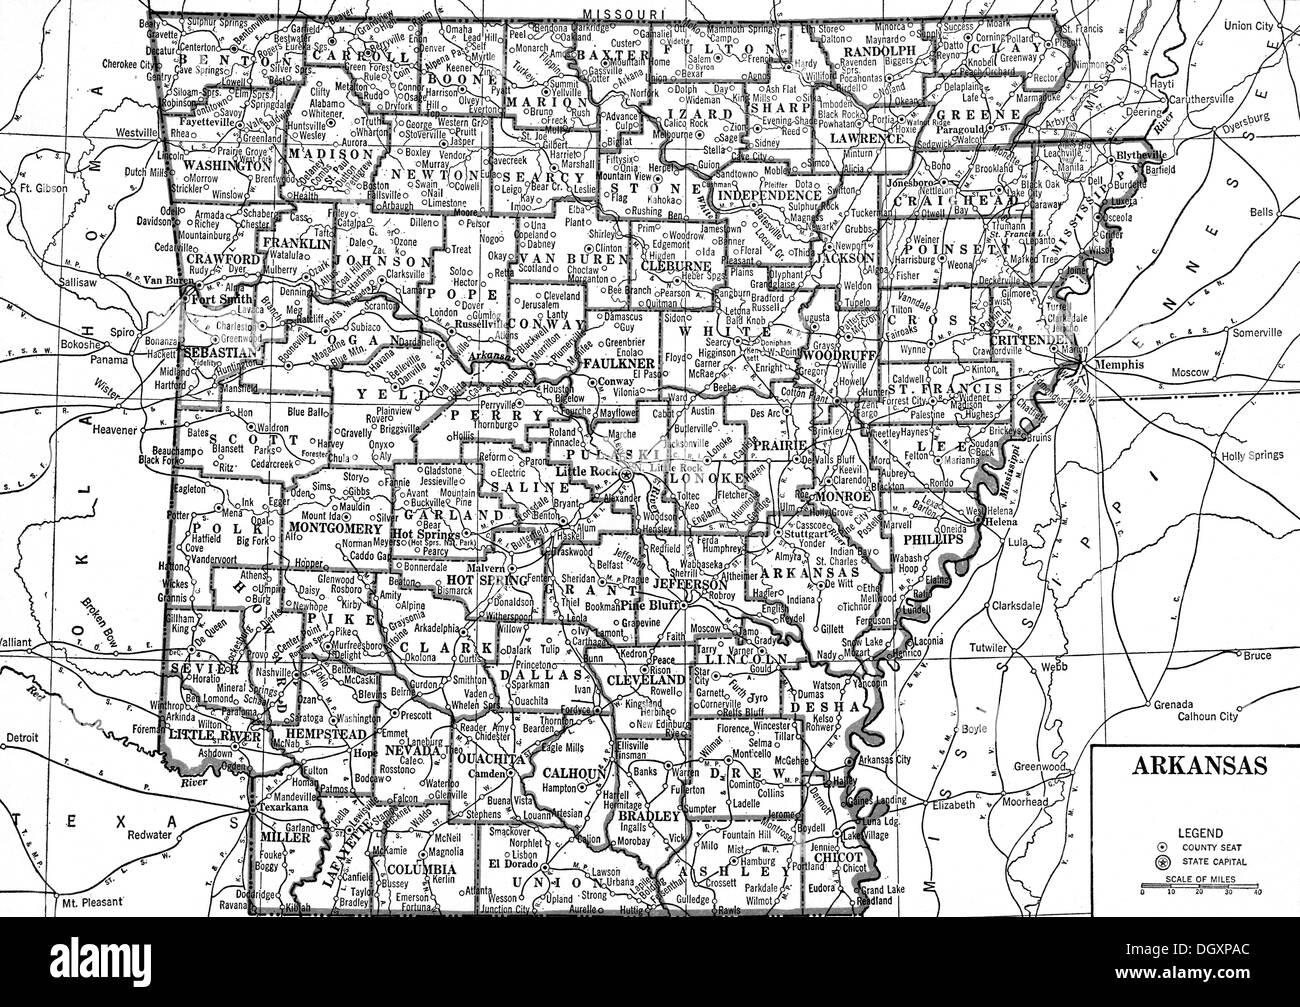 Arkansas State Map Stockfotos & Arkansas State Map Bilder - Alamy